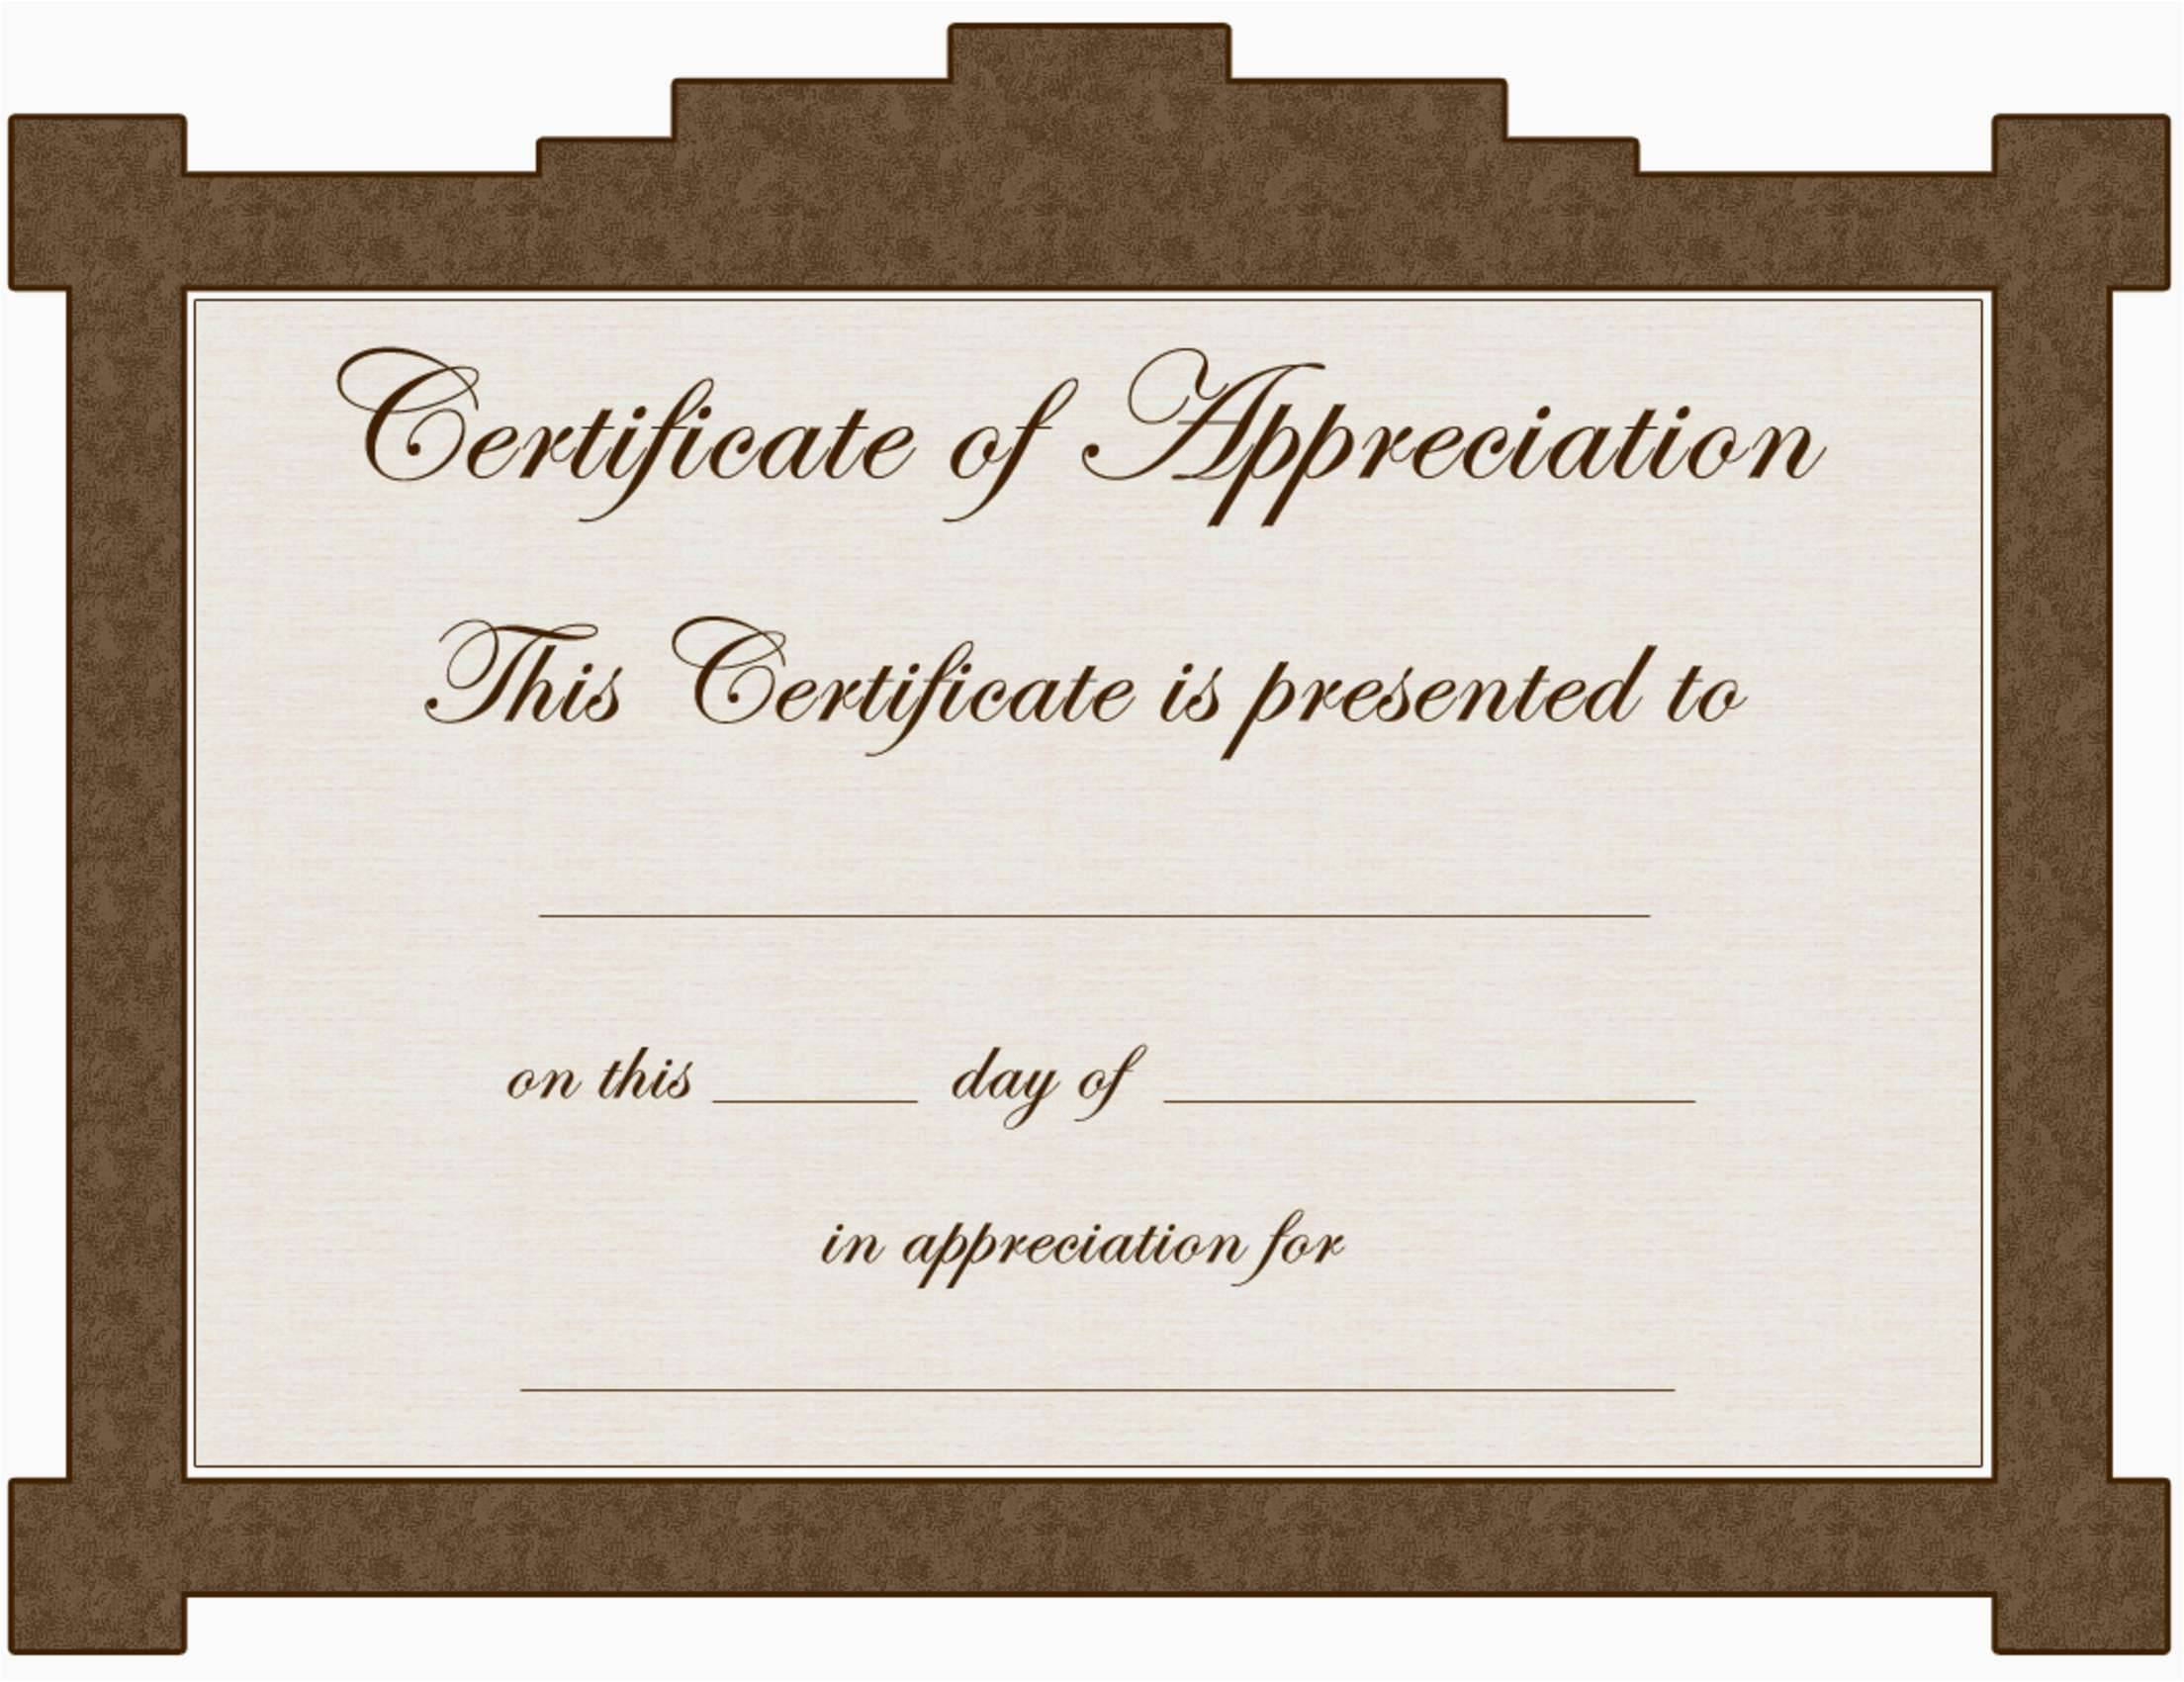 Volunteer Certificates Of Appreciation Templates